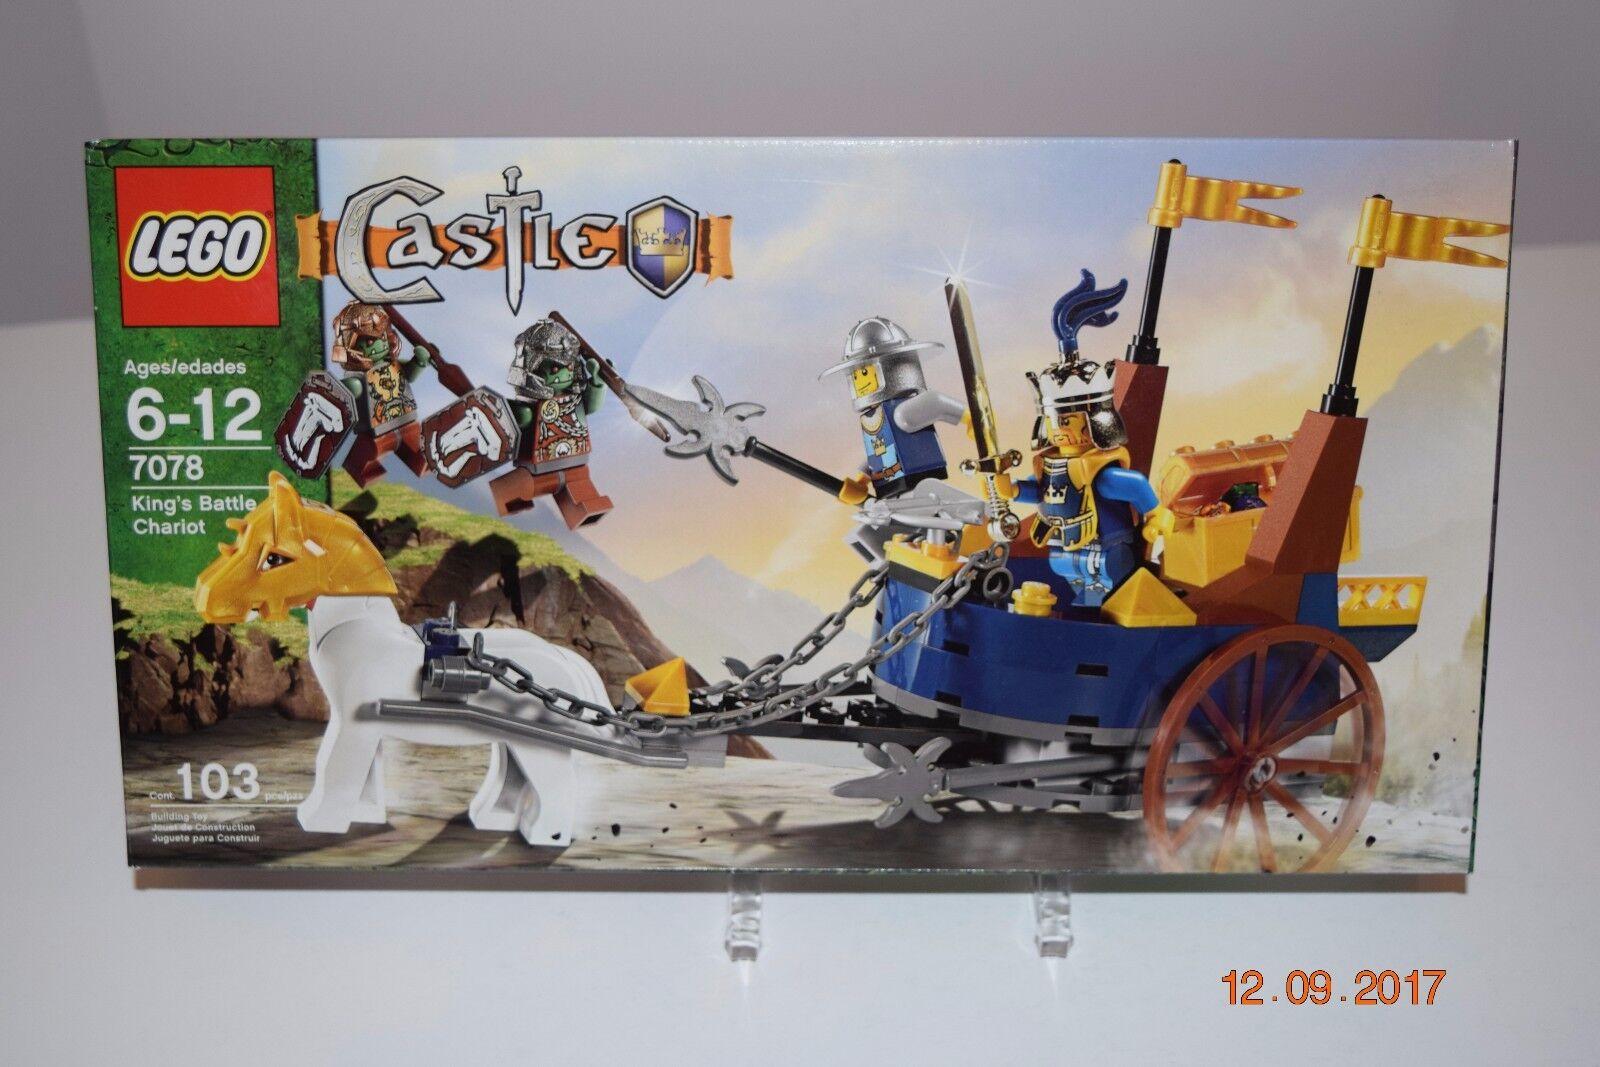 Lego 7078__King's Battle Chariot_Age 5+_103 PCS_Sealed__Retirosso_Rev PICs_NEW_NIB